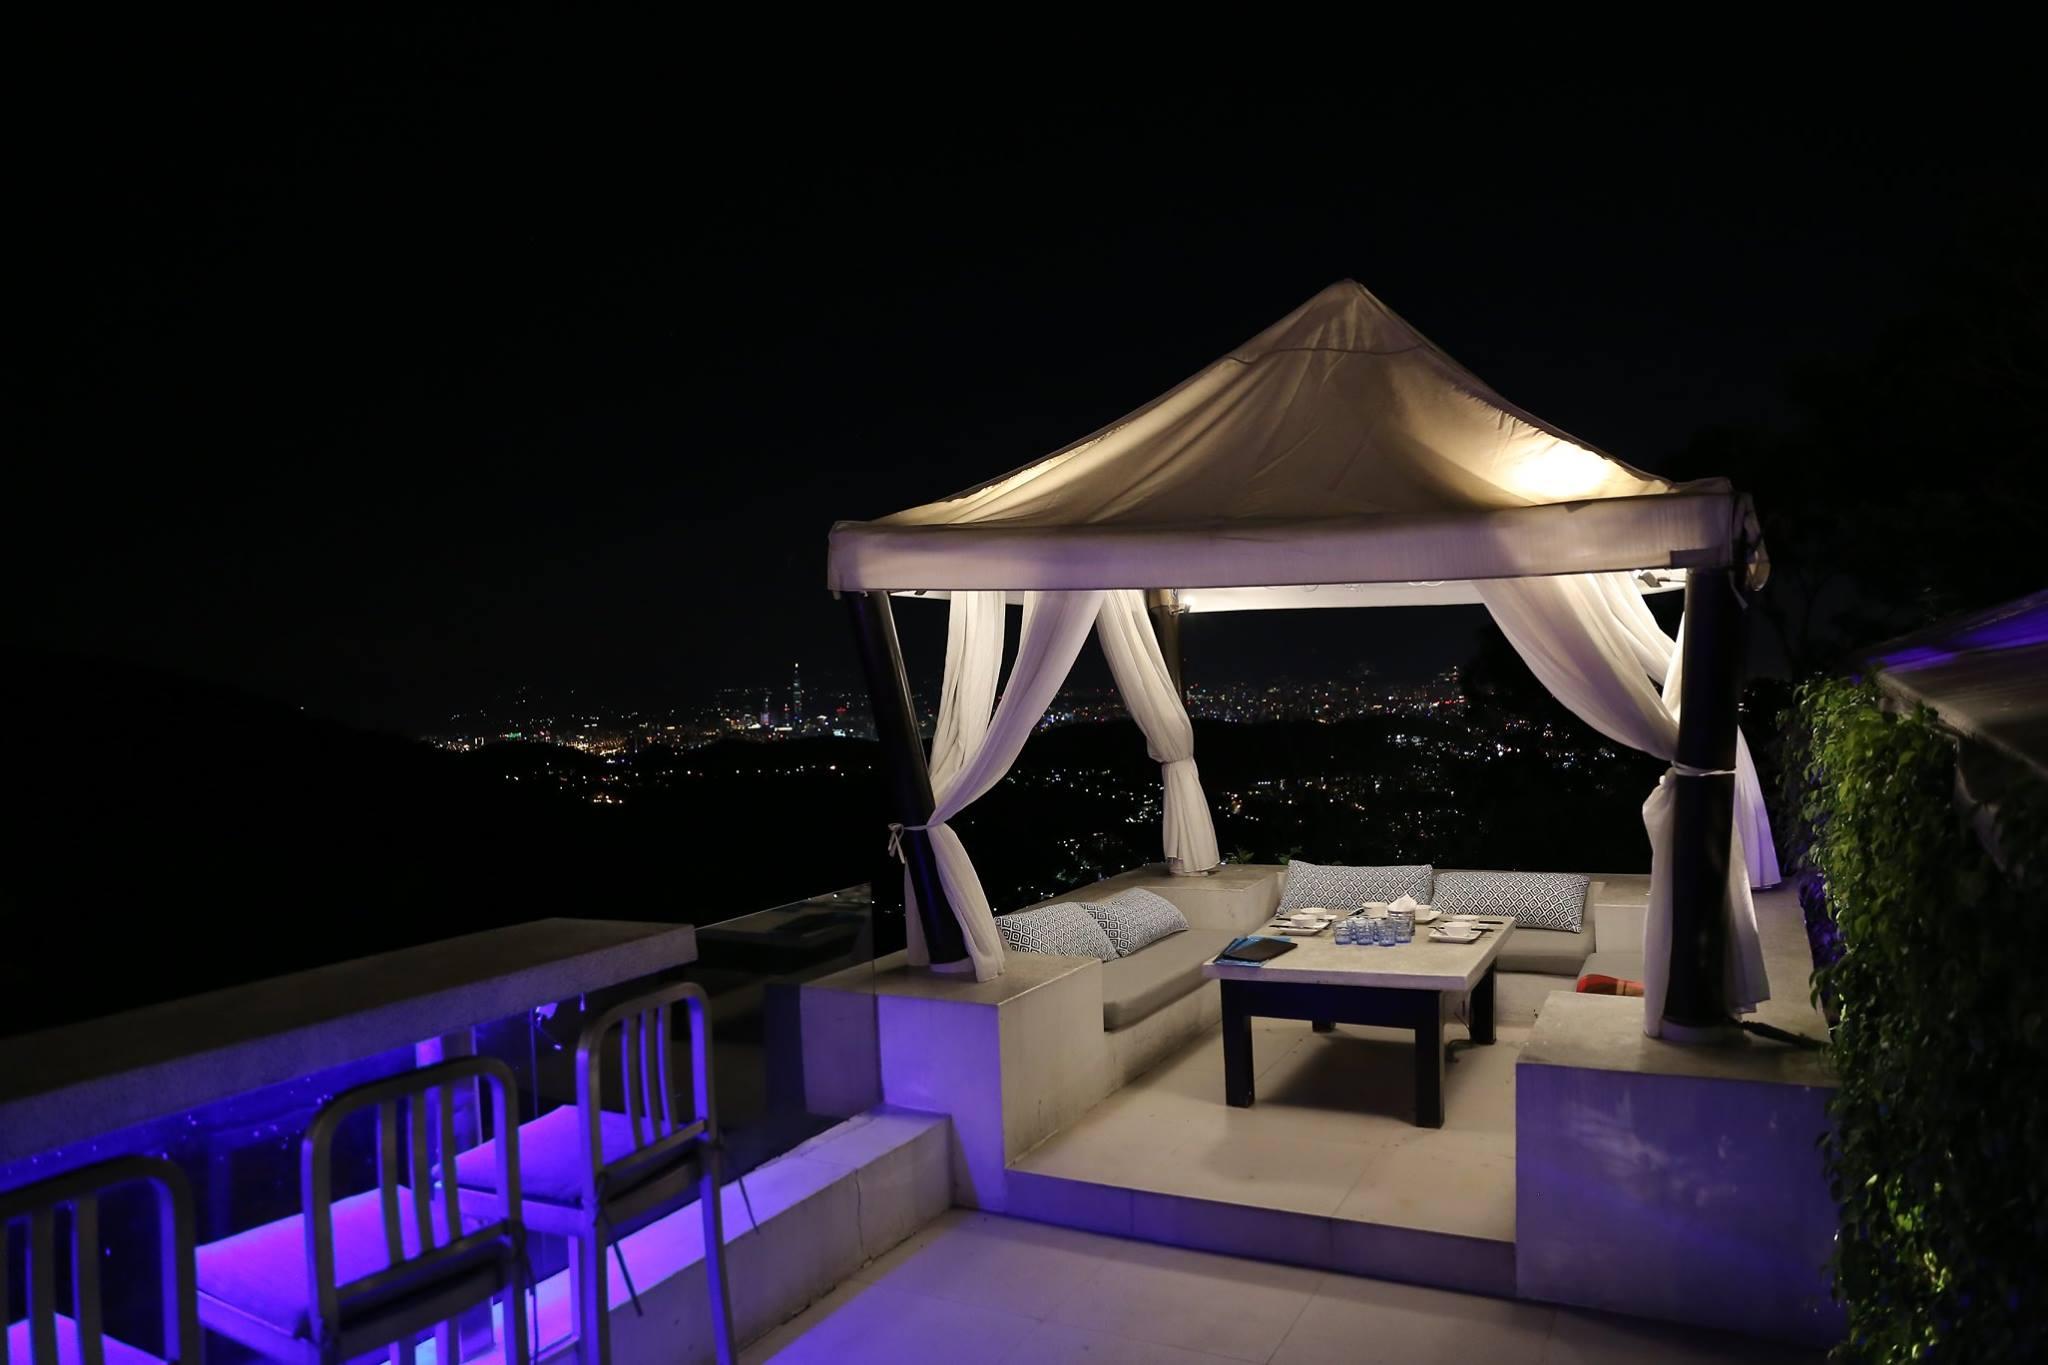 The top 屋頂上